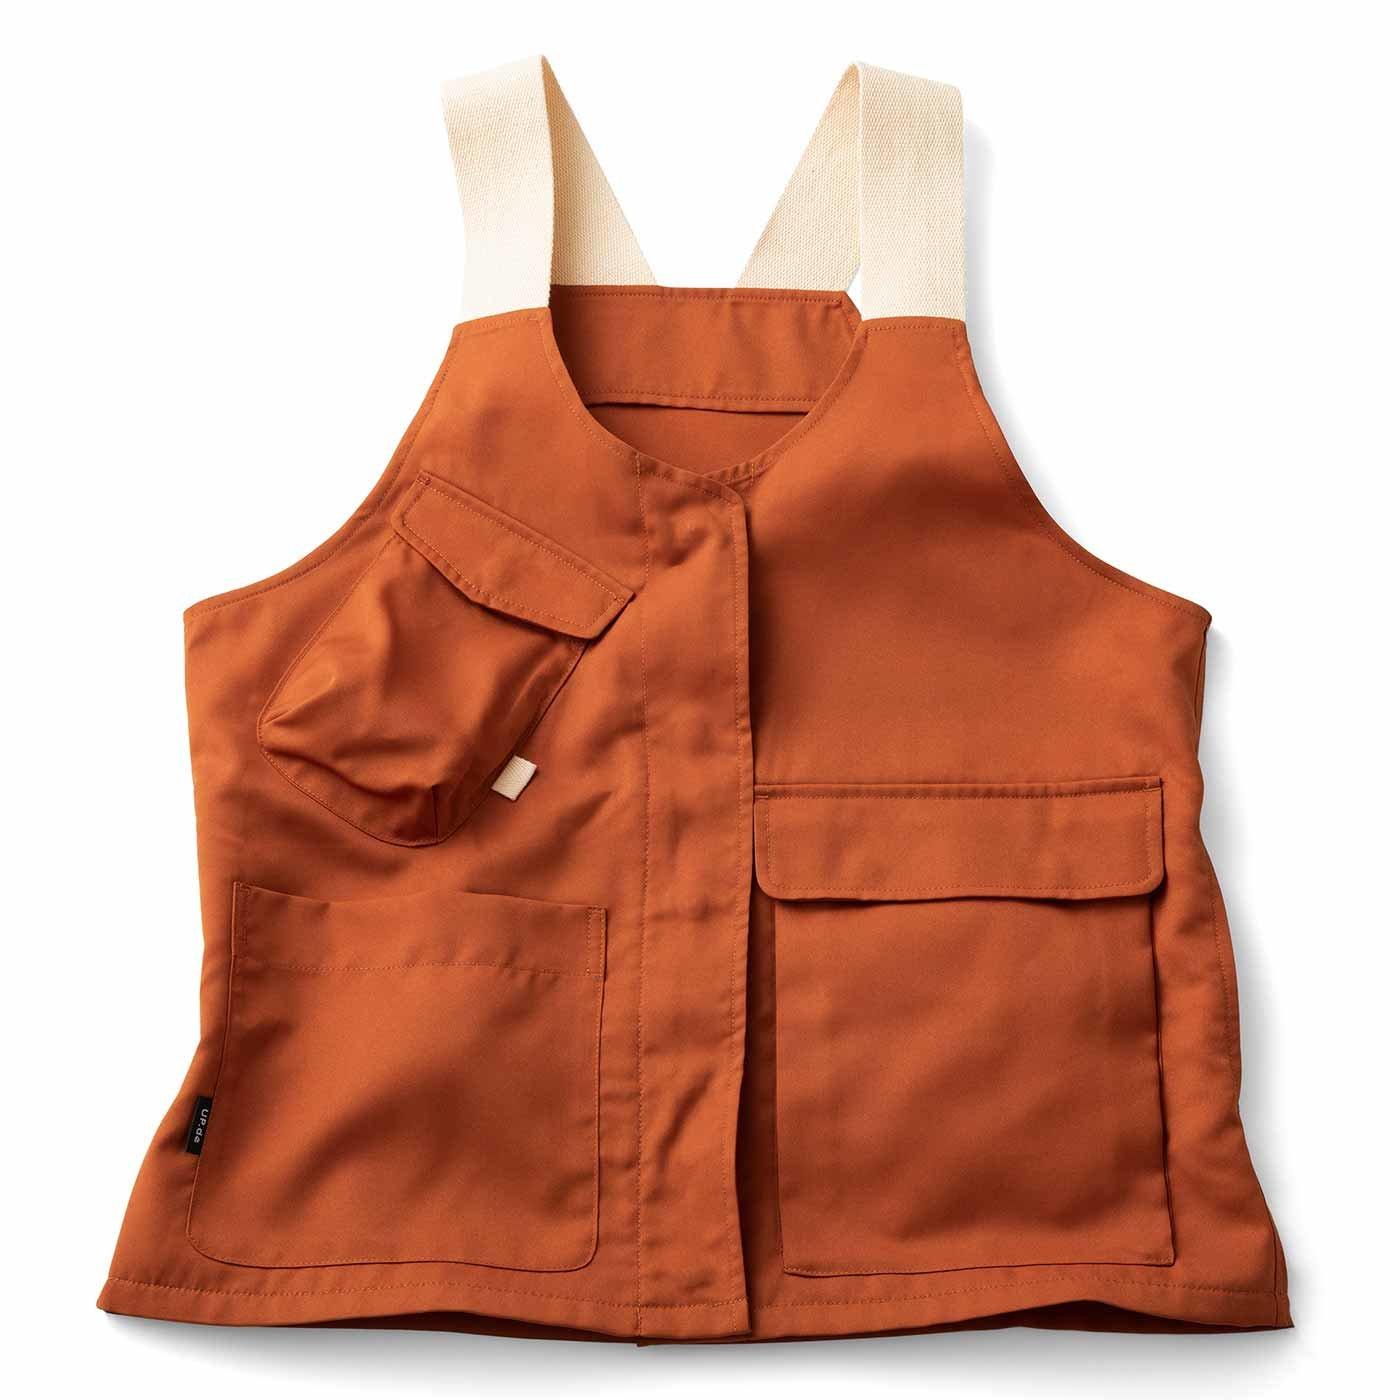 UP.de 着られるバッグで身軽にお出かけ マルチポケットベスト〈オレンジ〉